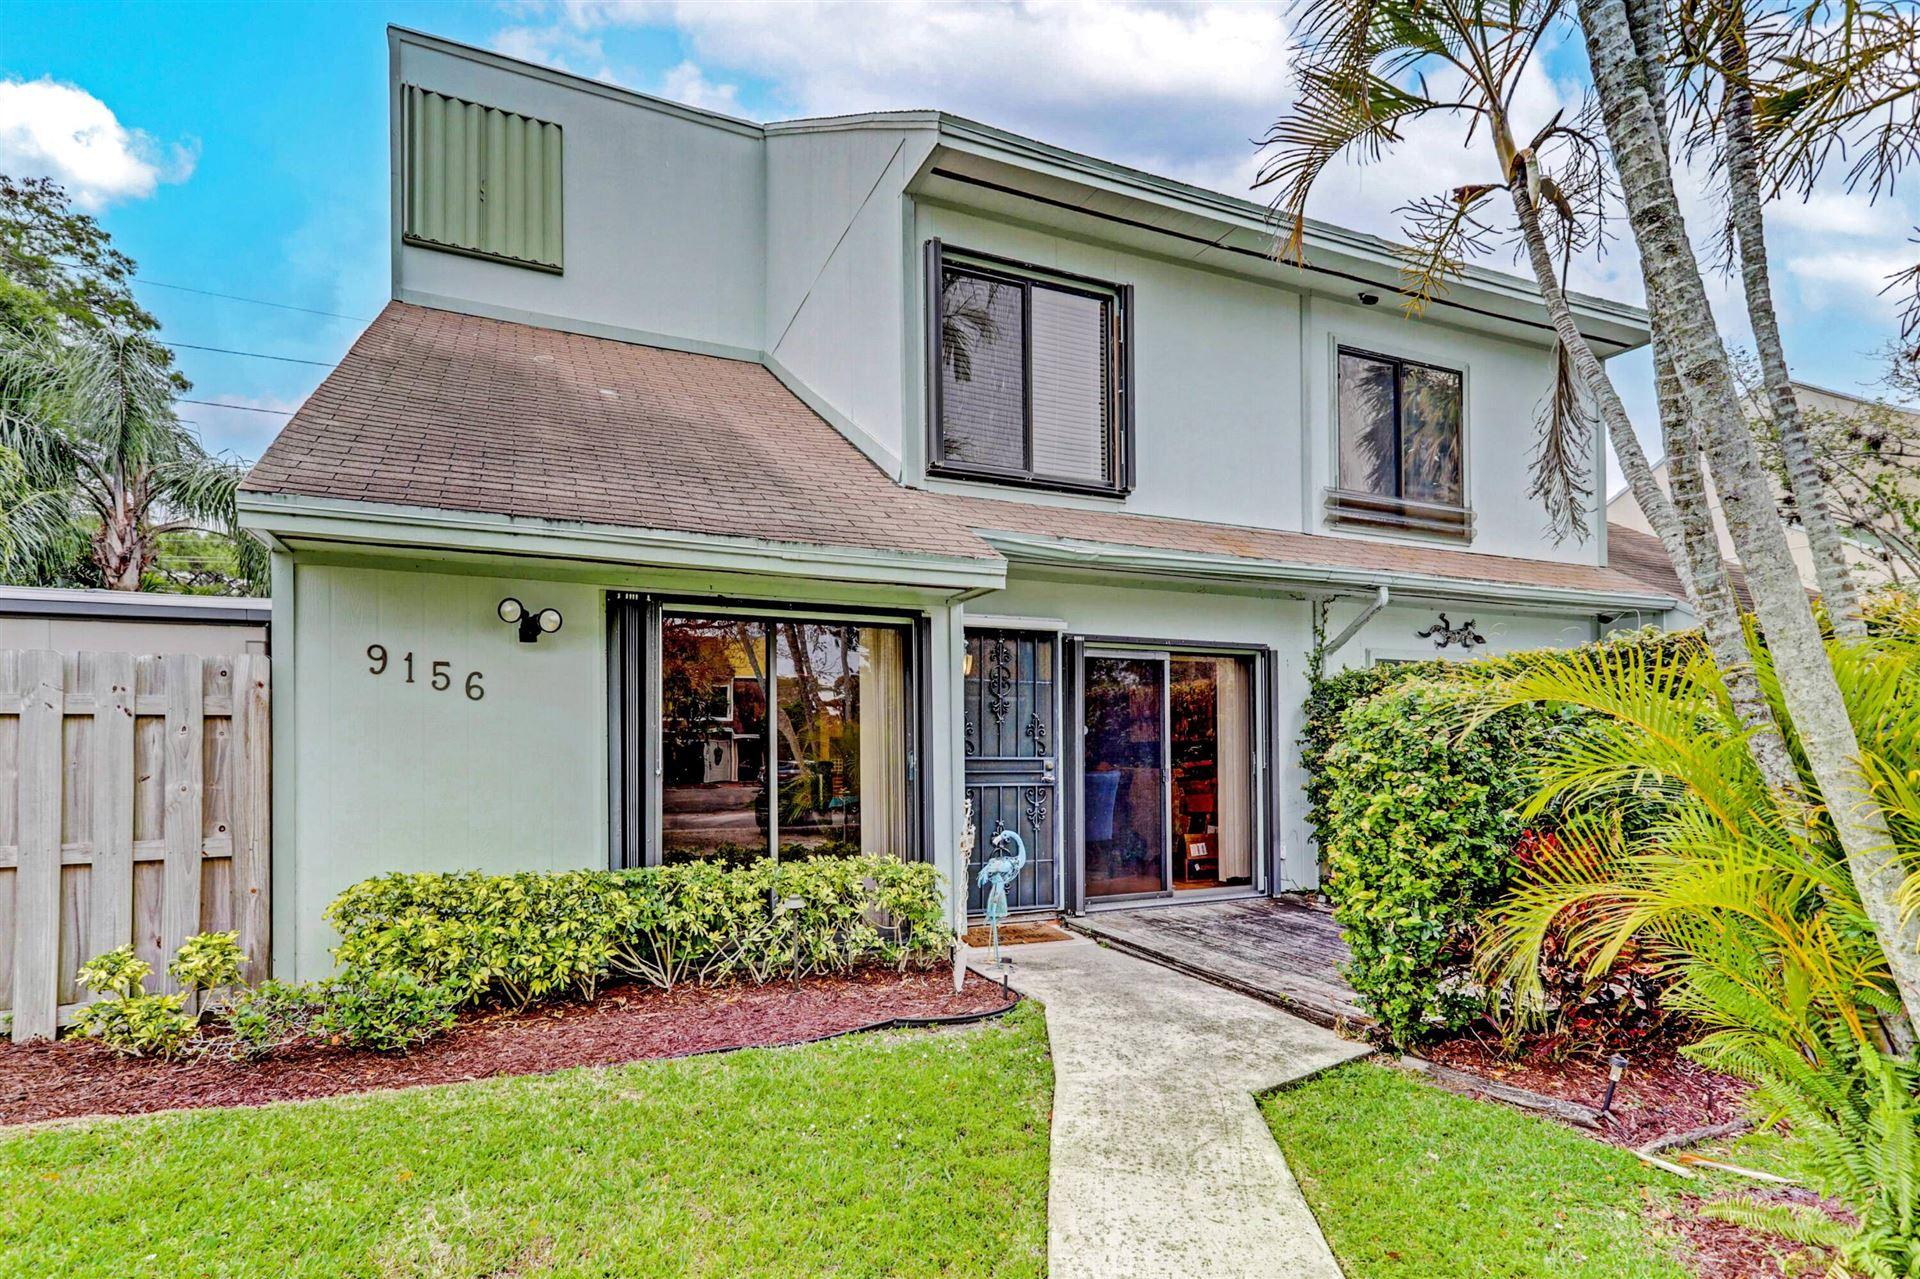 9156 Green Meadows Way, Palm Beach Gardens, FL 33418 - MLS#: RX-10709917